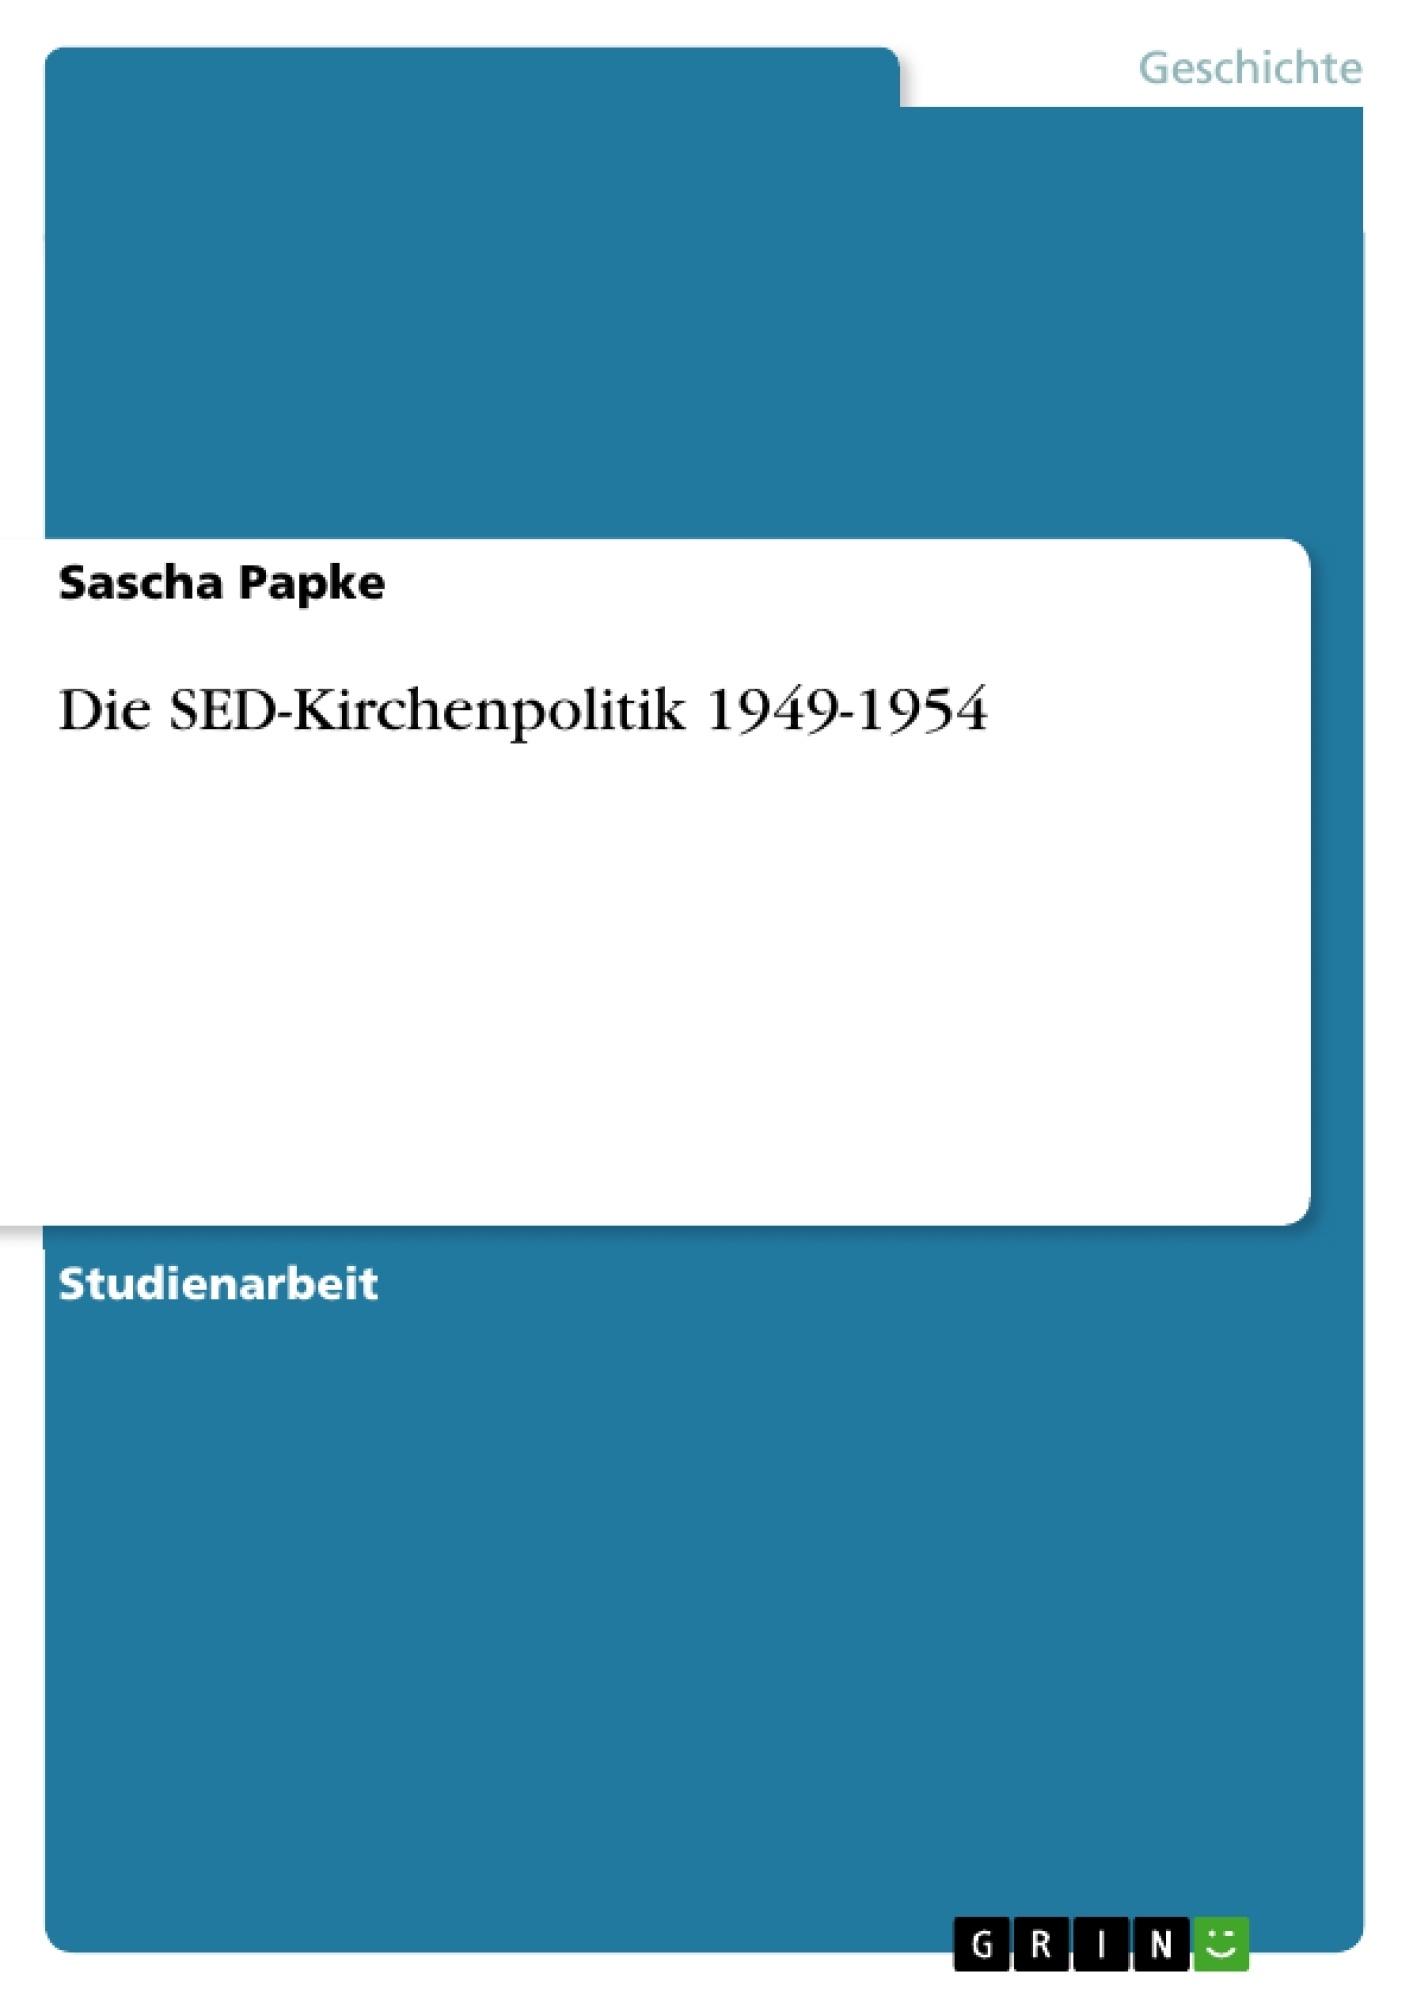 Titel: Die SED-Kirchenpolitik 1949-1954